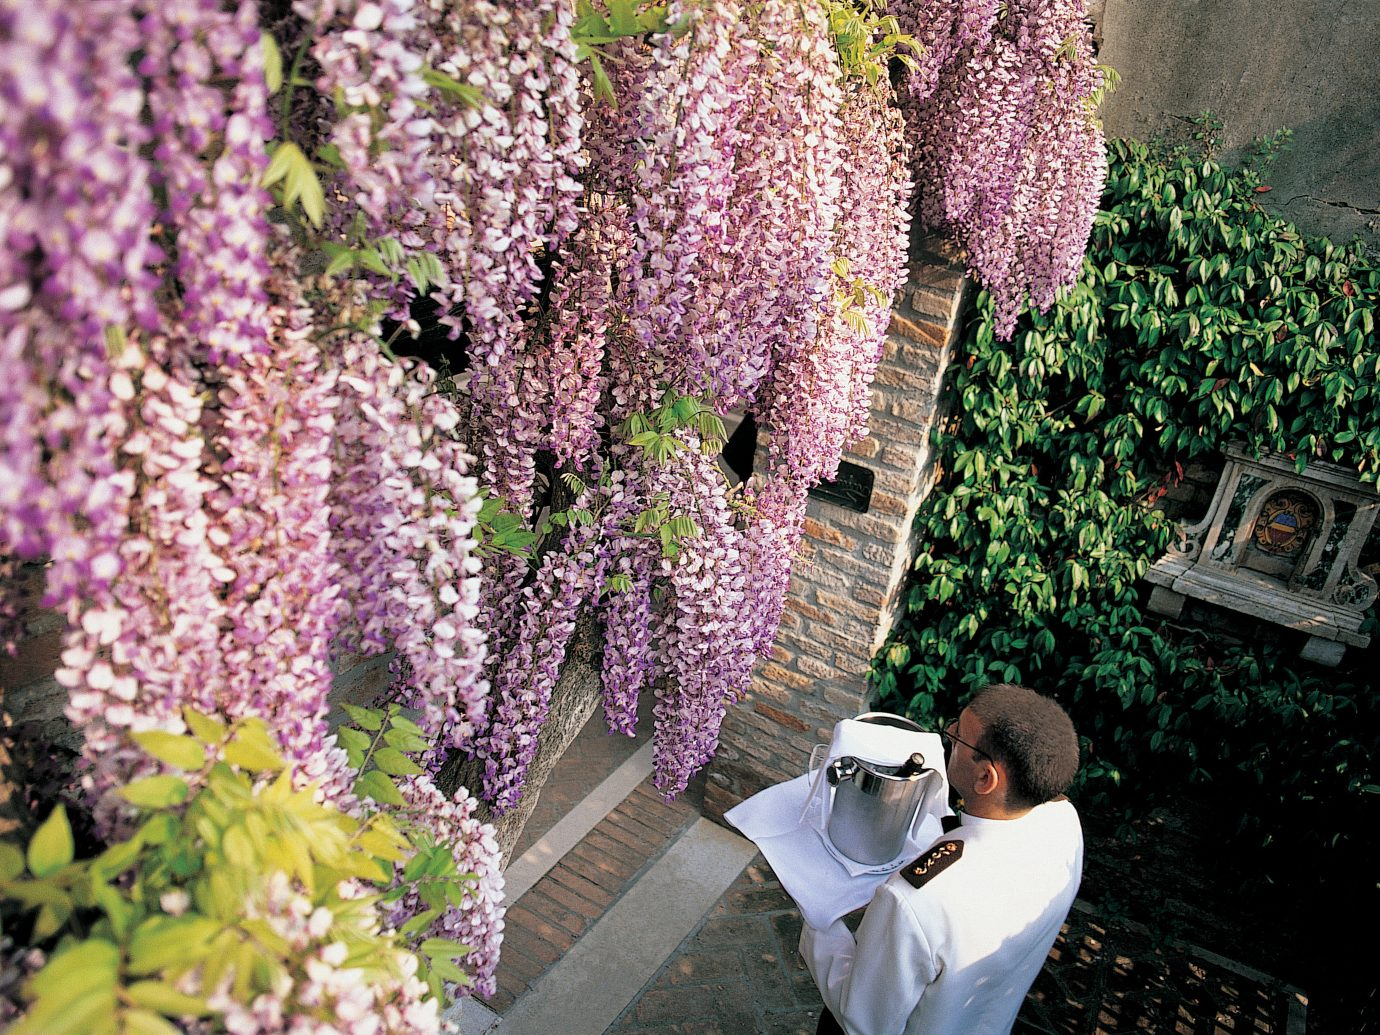 Celebs Hotels Trip Ideas flower plant purple spring flora Garden shrub tree